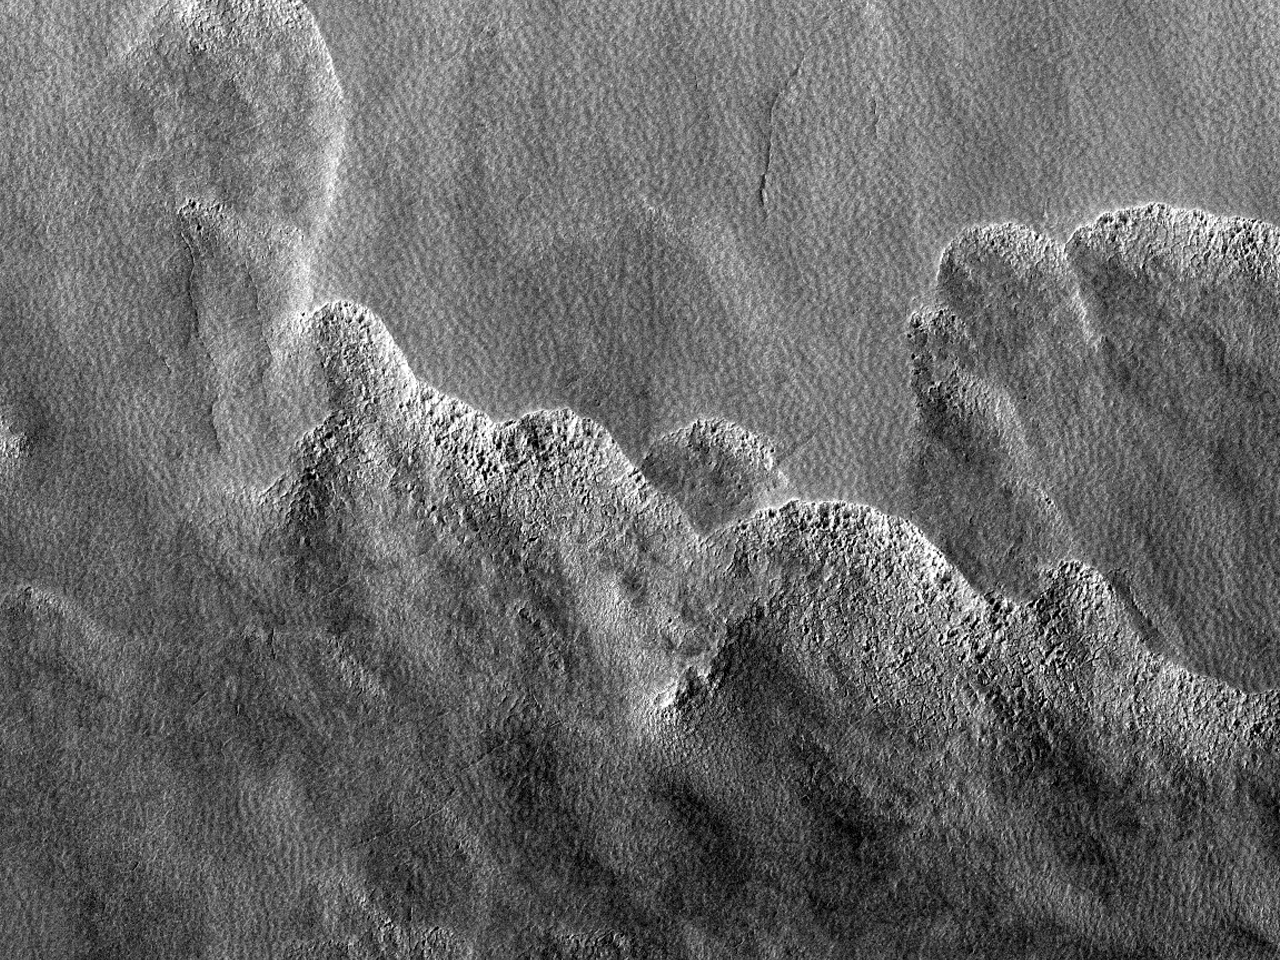 Teren la sud de Hellas Planitia